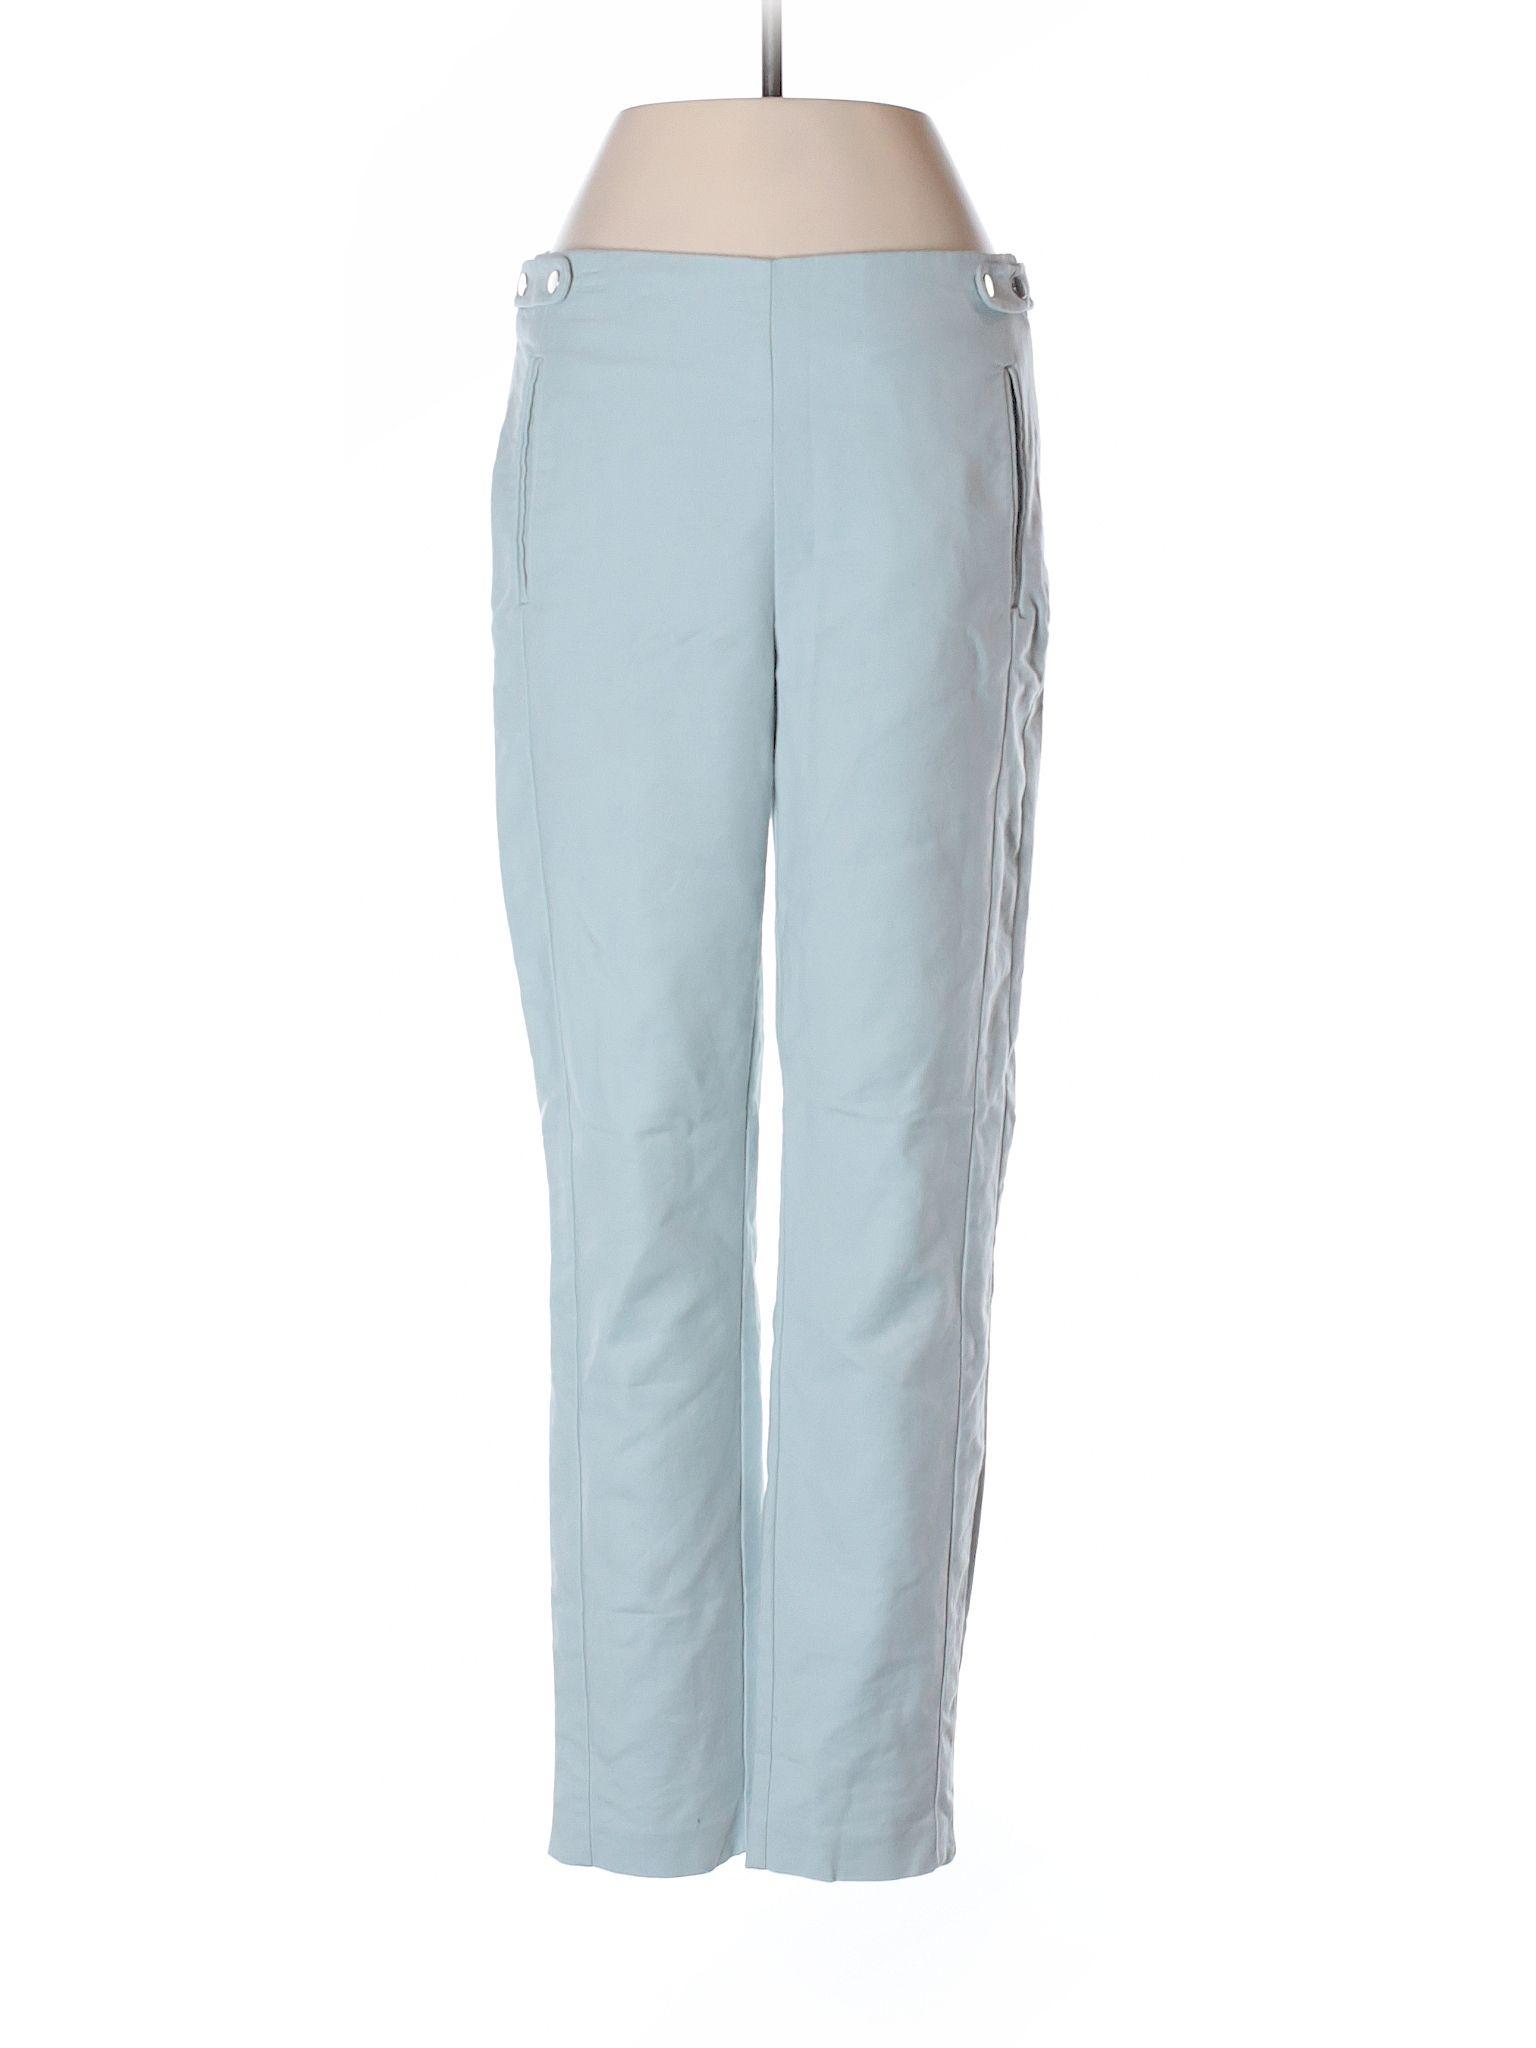 823c4b5b Dress Pants   Products   Trousers, Blue dress pants, Dress pants